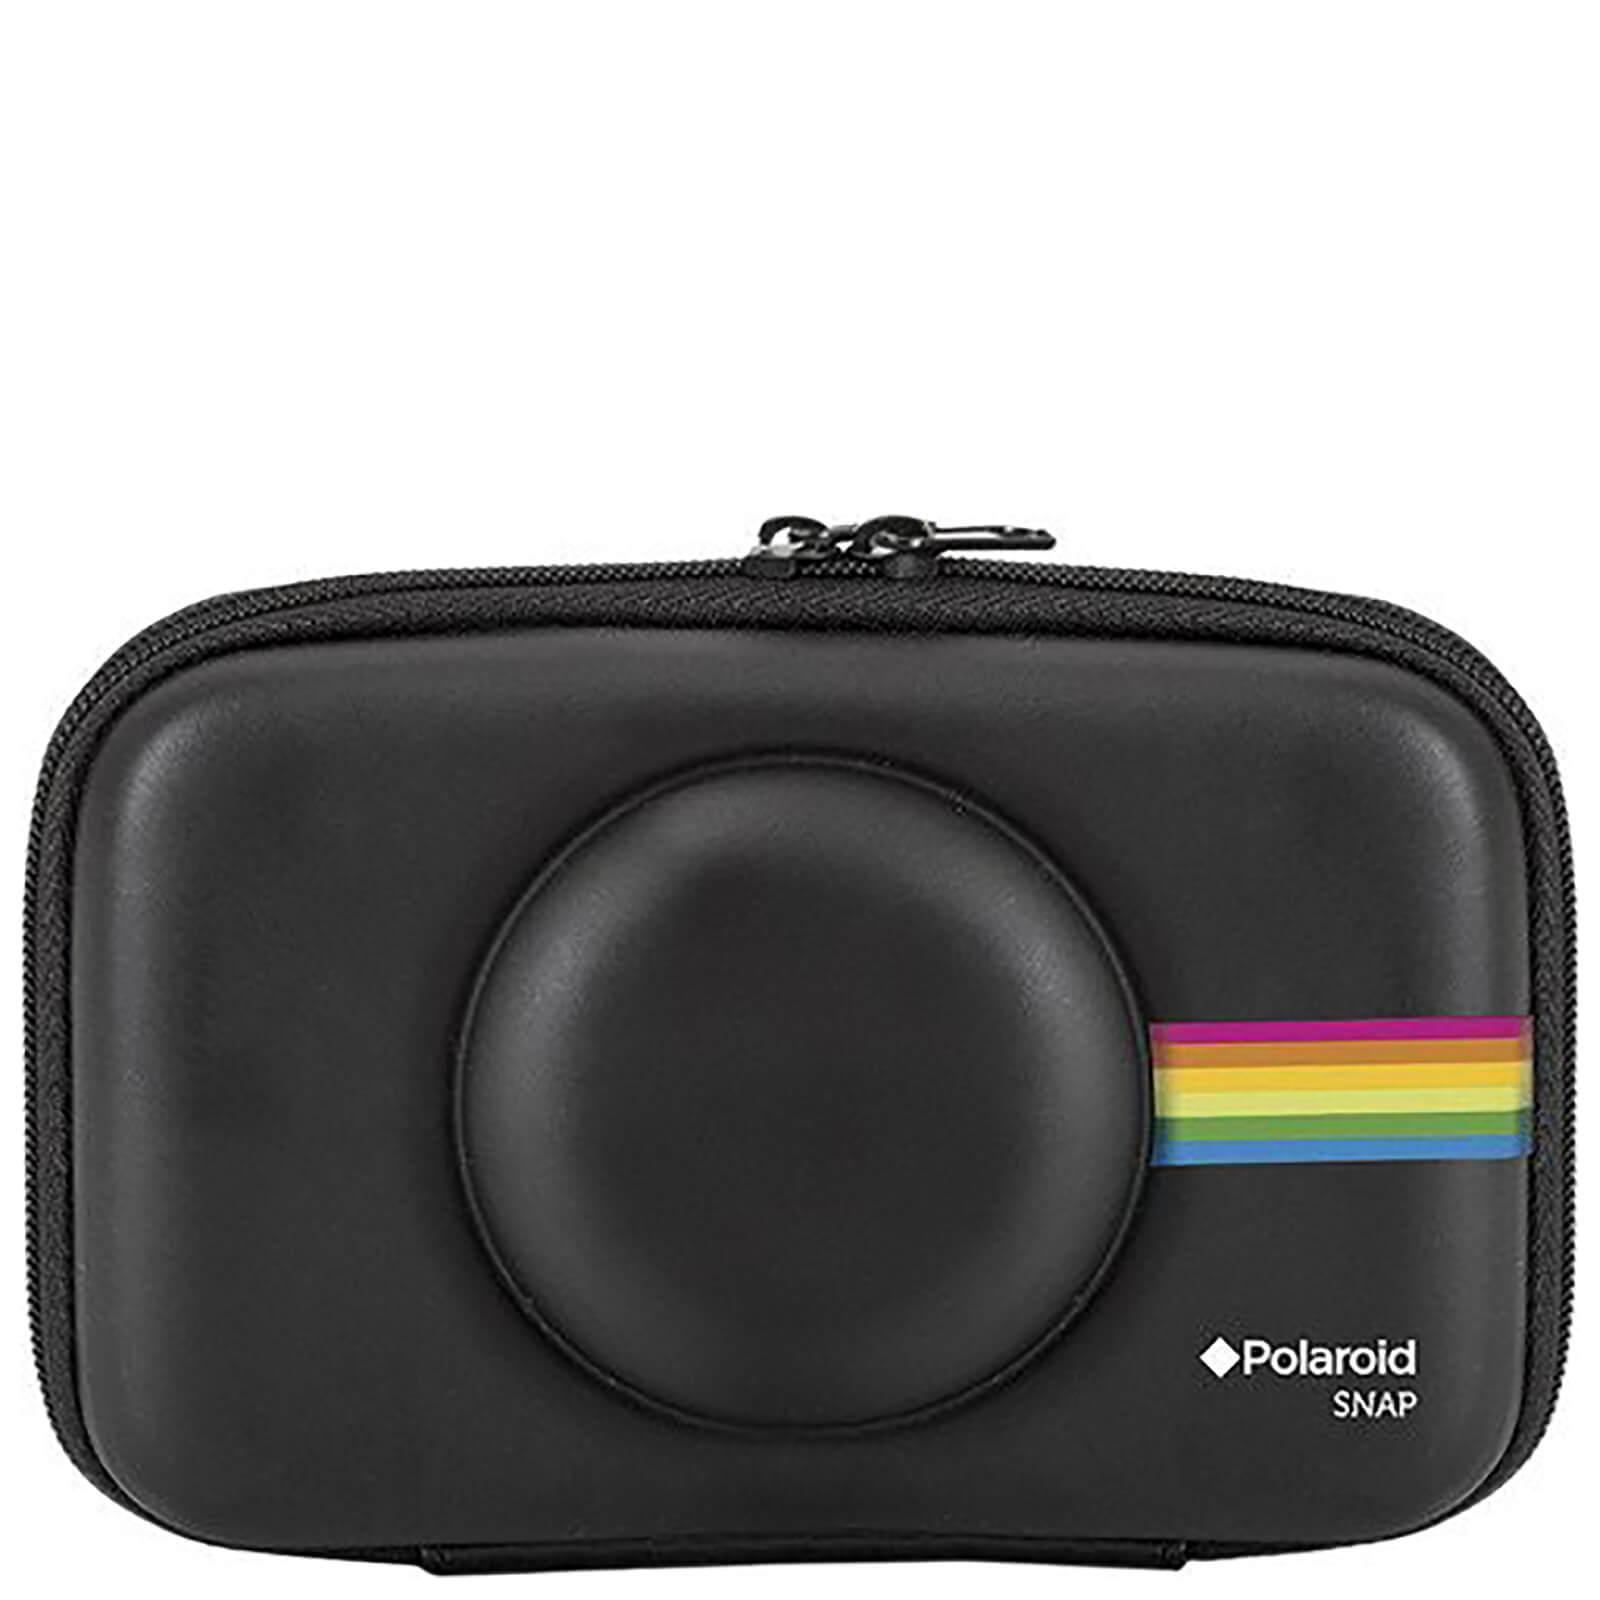 Polaroid EVA Case (For Snap Instant Digital Print Camera) - Black